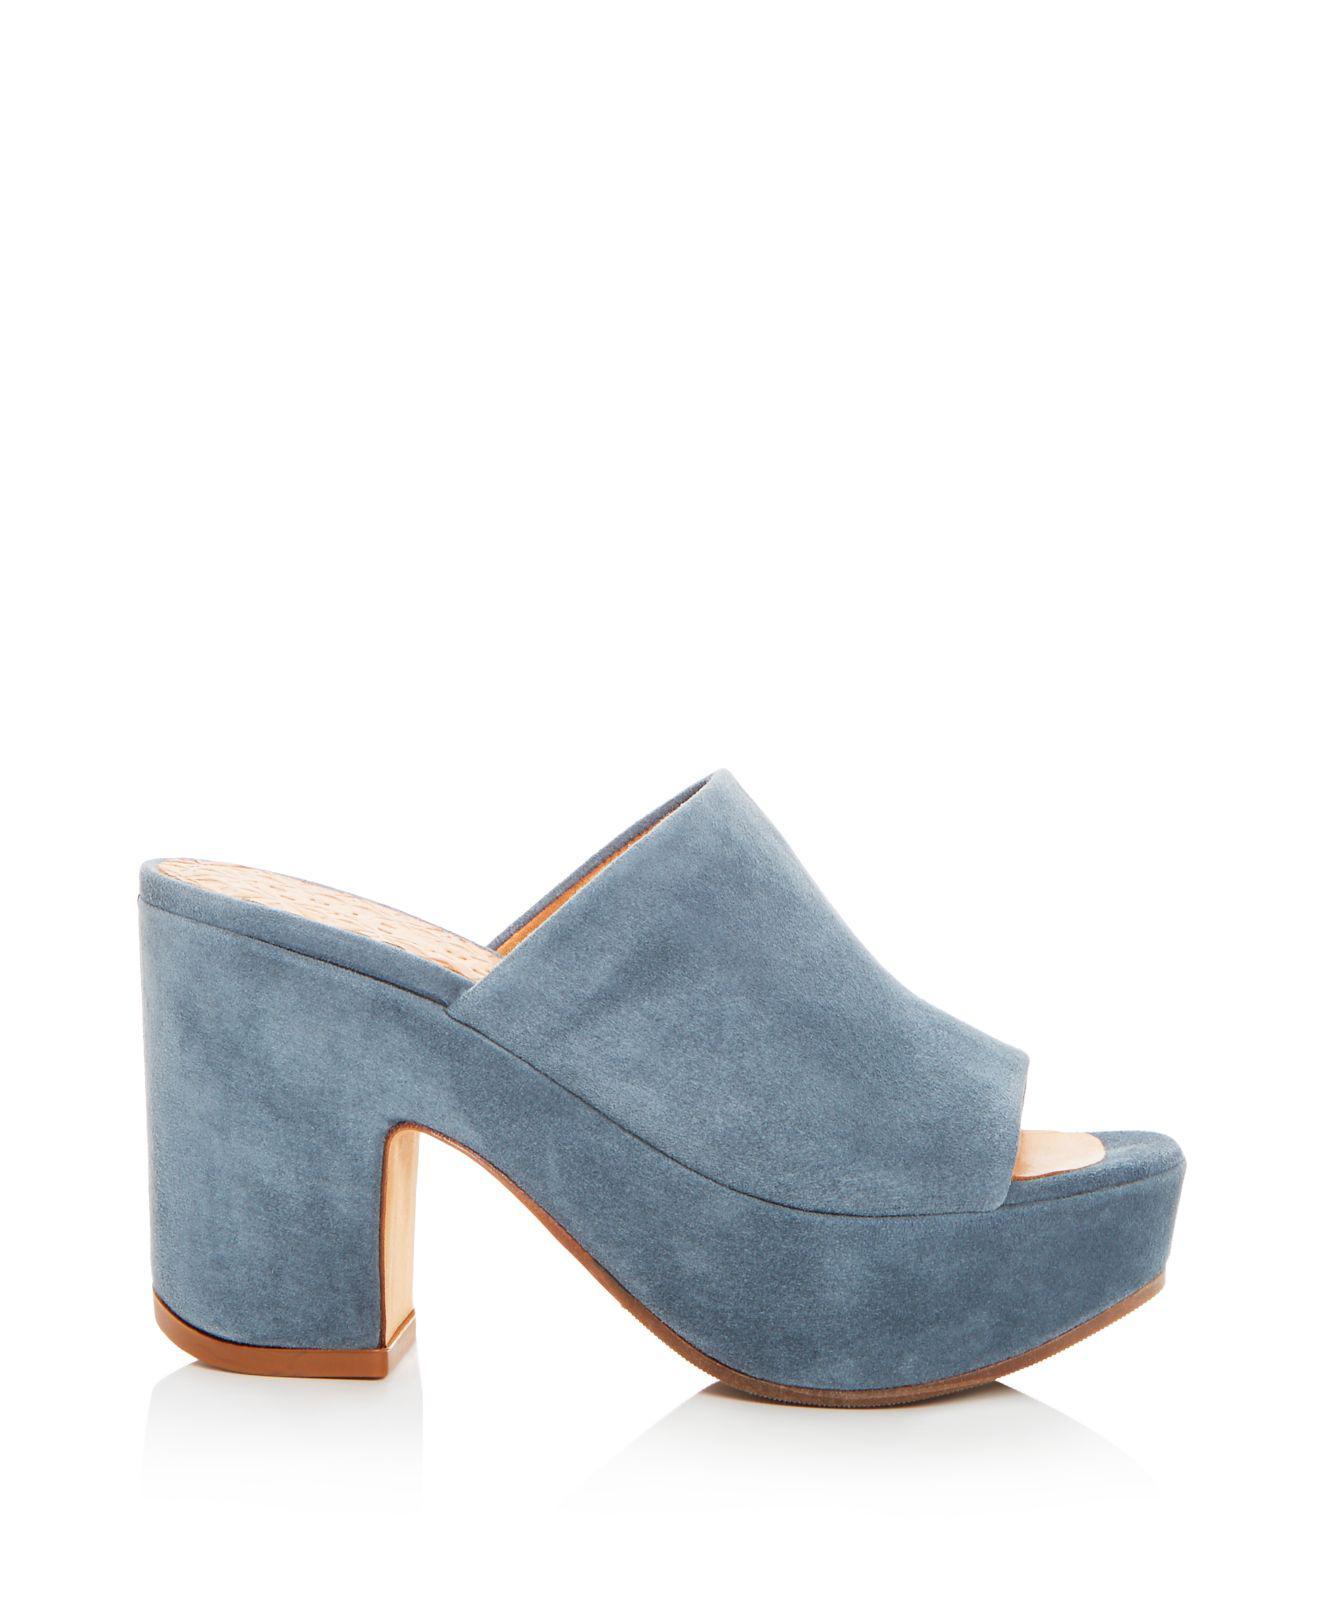 Chie Mihara Women's Fumie Suede High-Heel Platform Slide Sandals - 100% Exclusive FqrUYe4